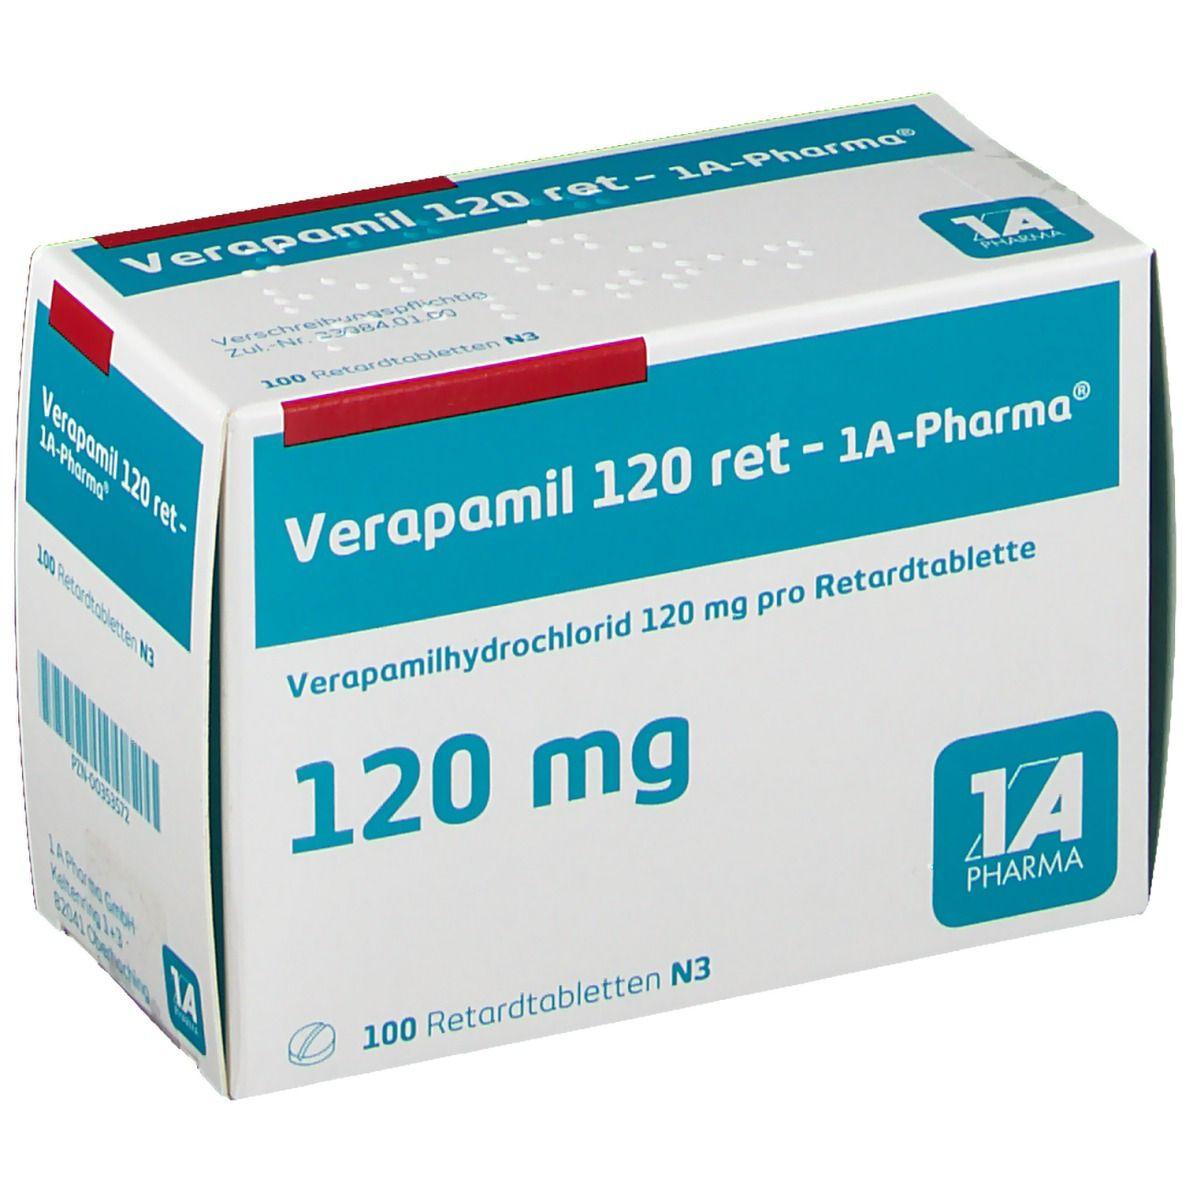 Seroquel 50 mg for sleep